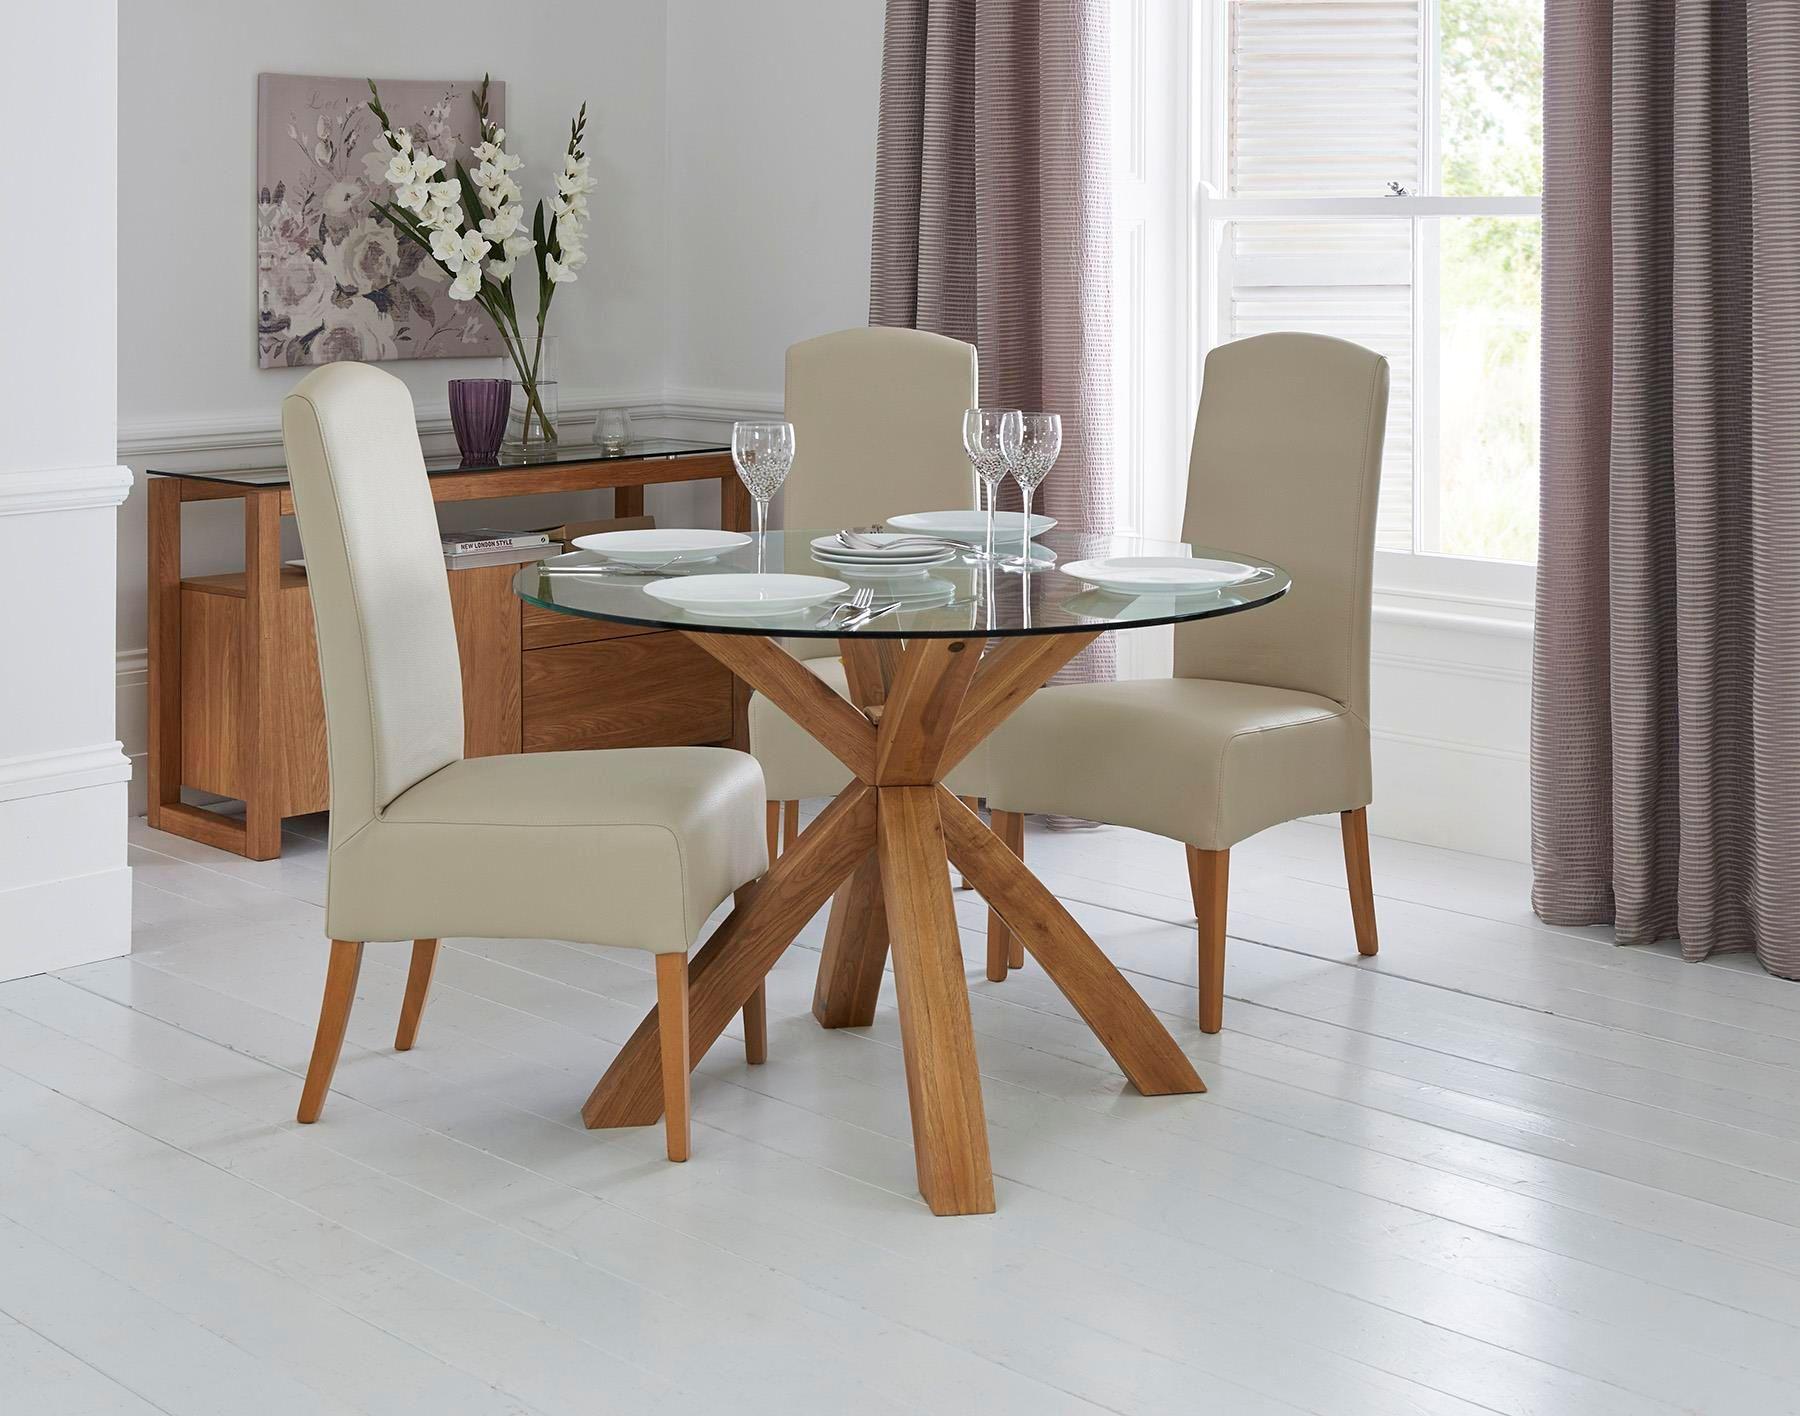 Milano X Glass Wood Coffee Table Oak 135 W X 80 D X 45 H Cm